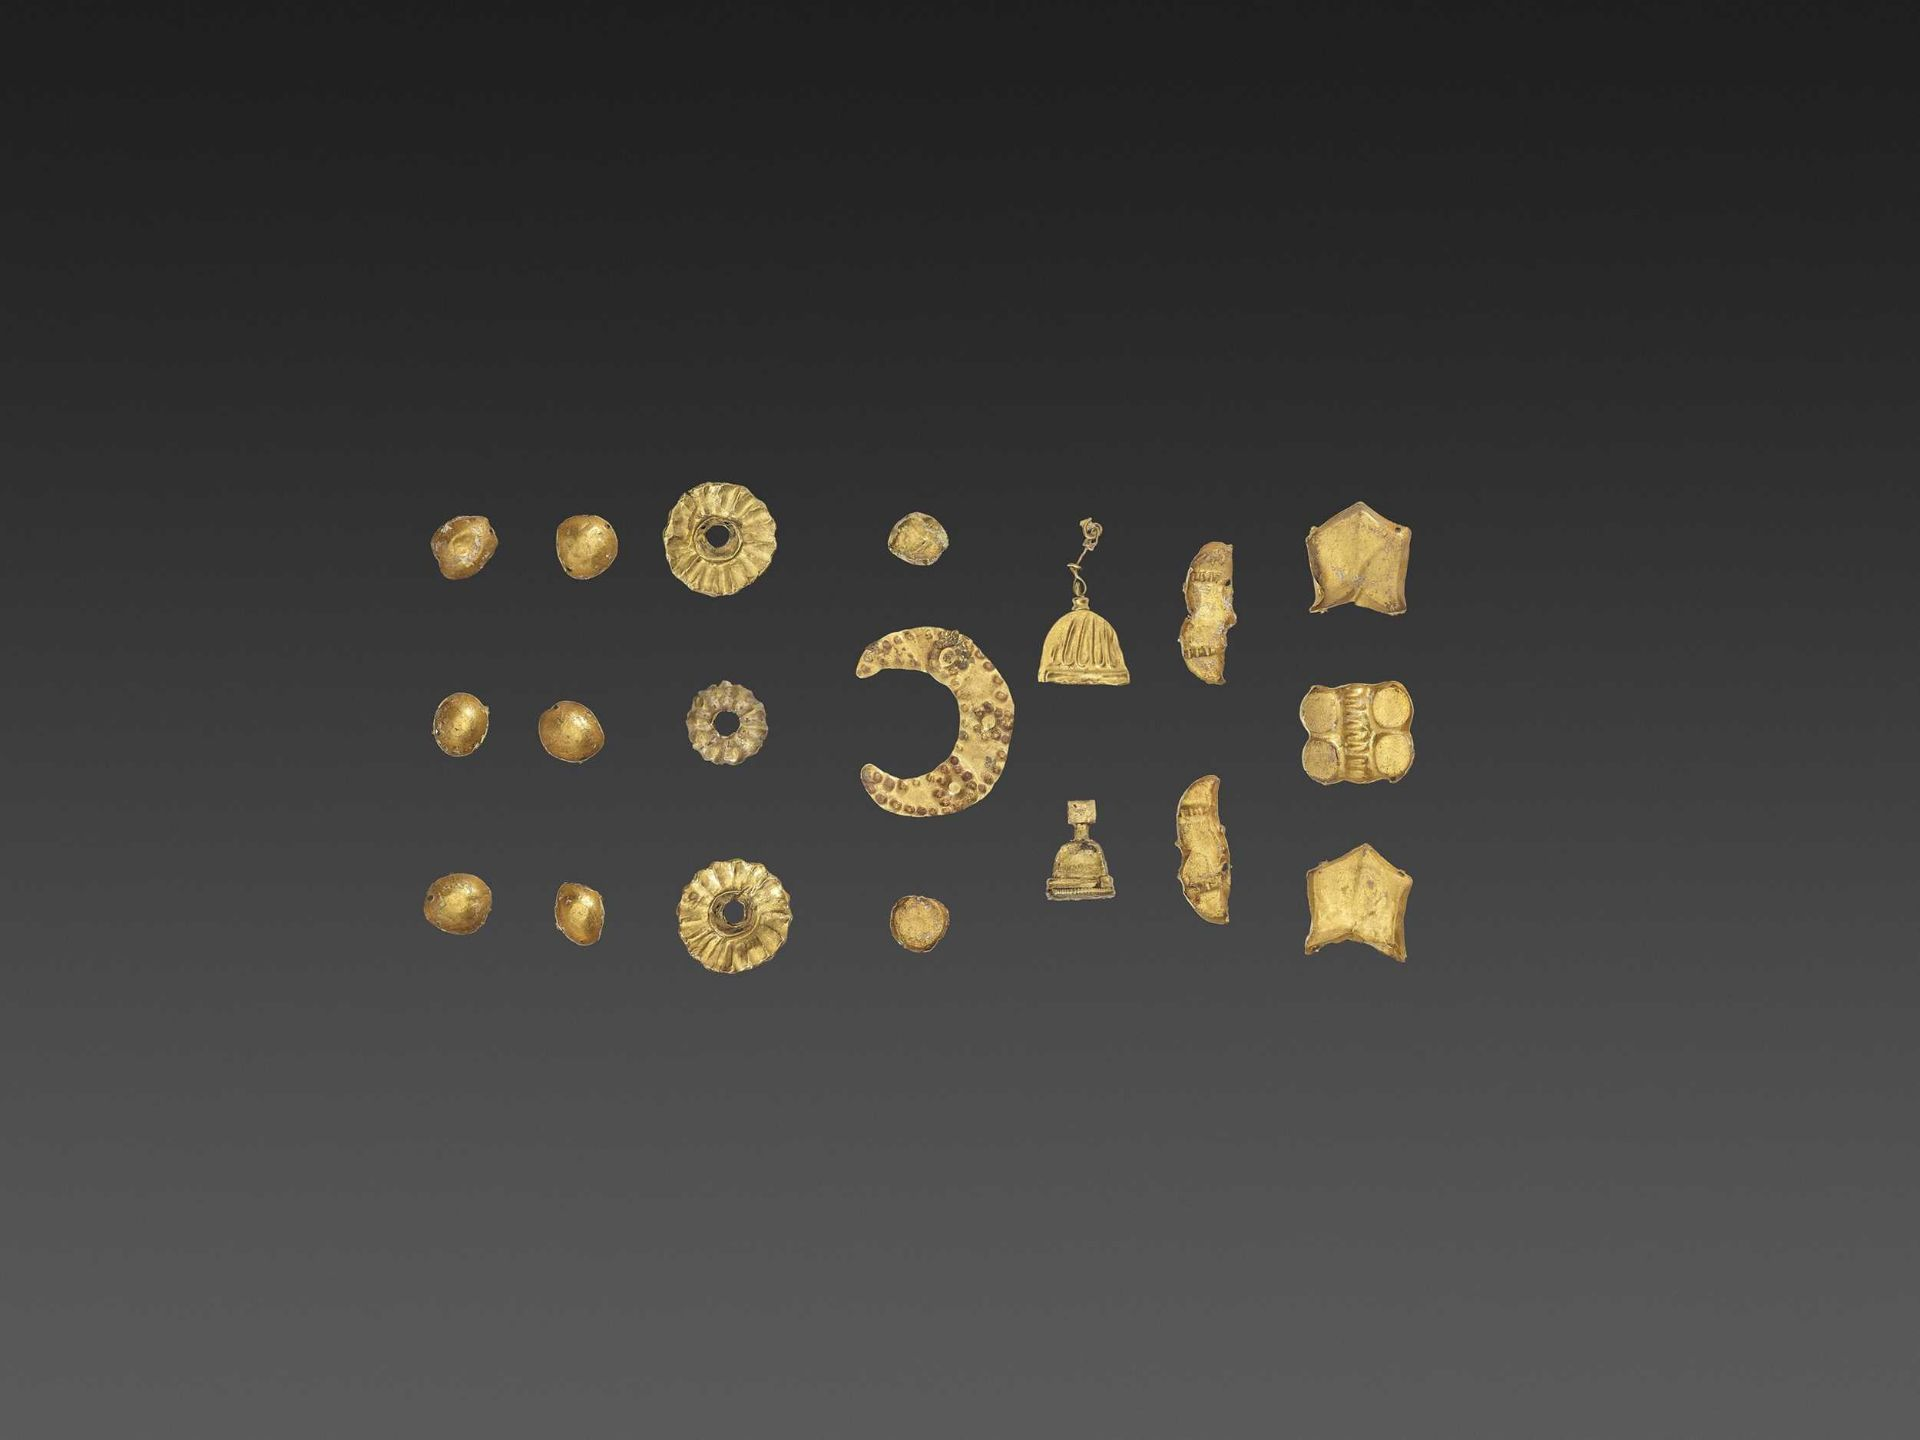 19 BACTRIAN GOLD GARMENT ORNAMENTS - Bild 4 aus 5